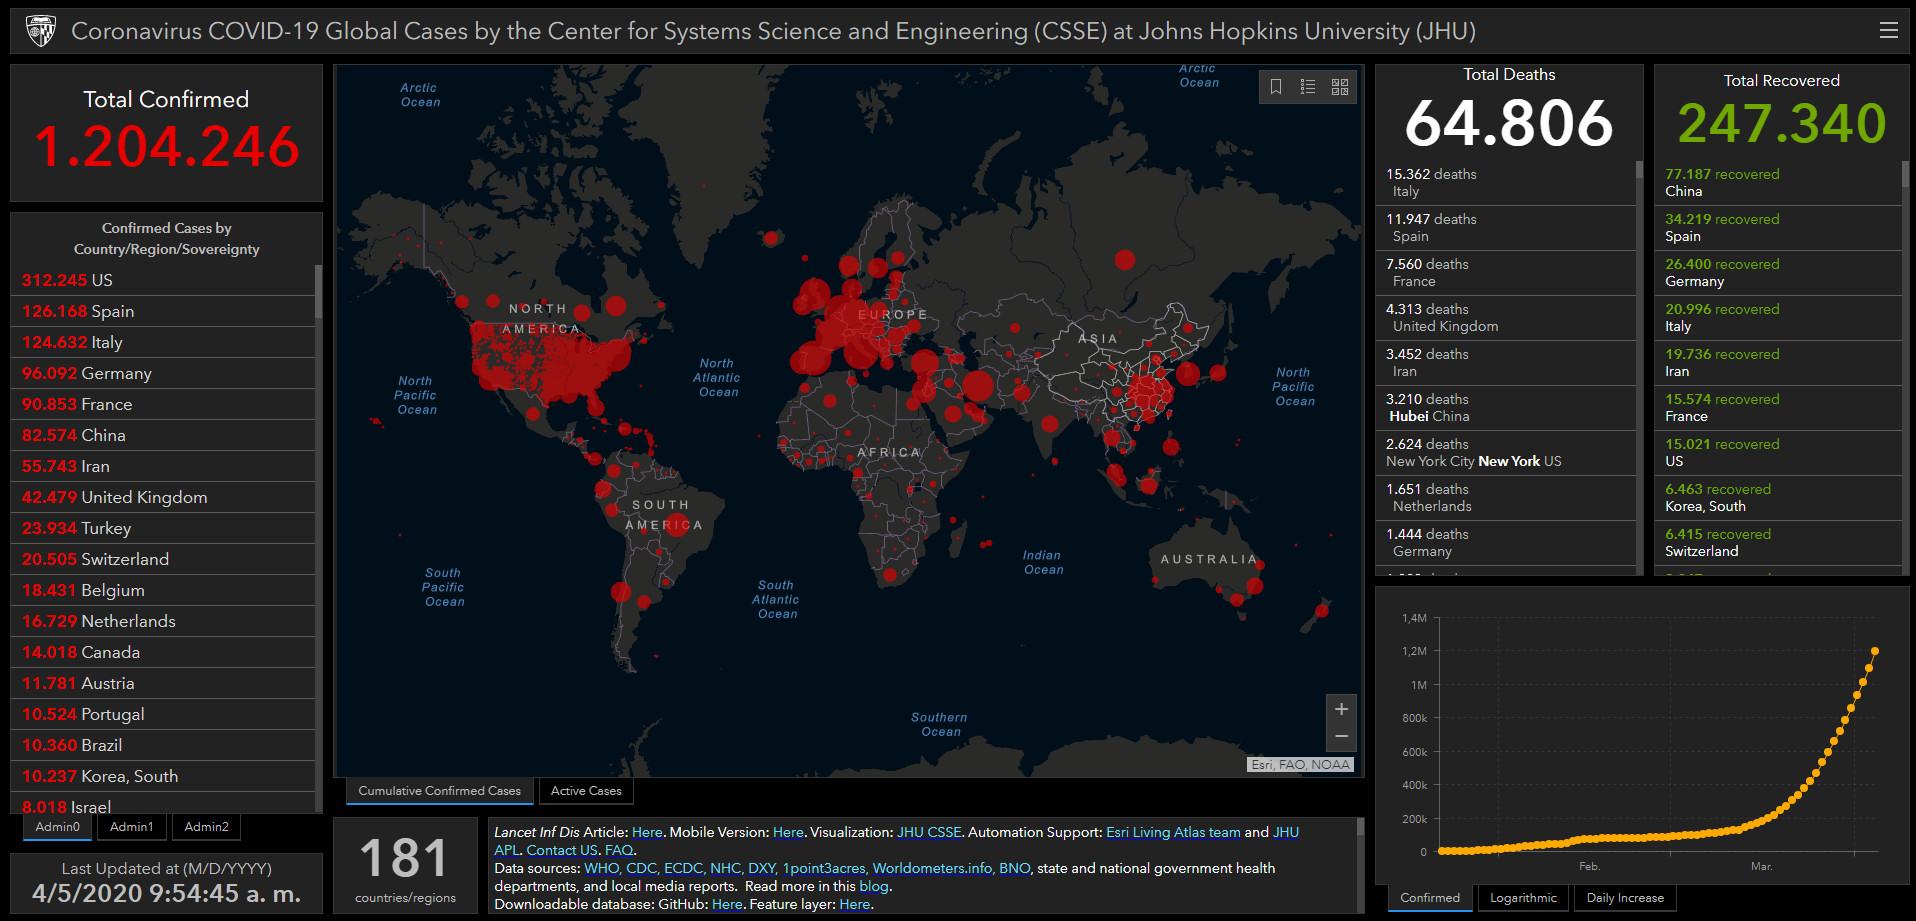 coronavirus covid estadisticas globales mapa 5 abril 2020